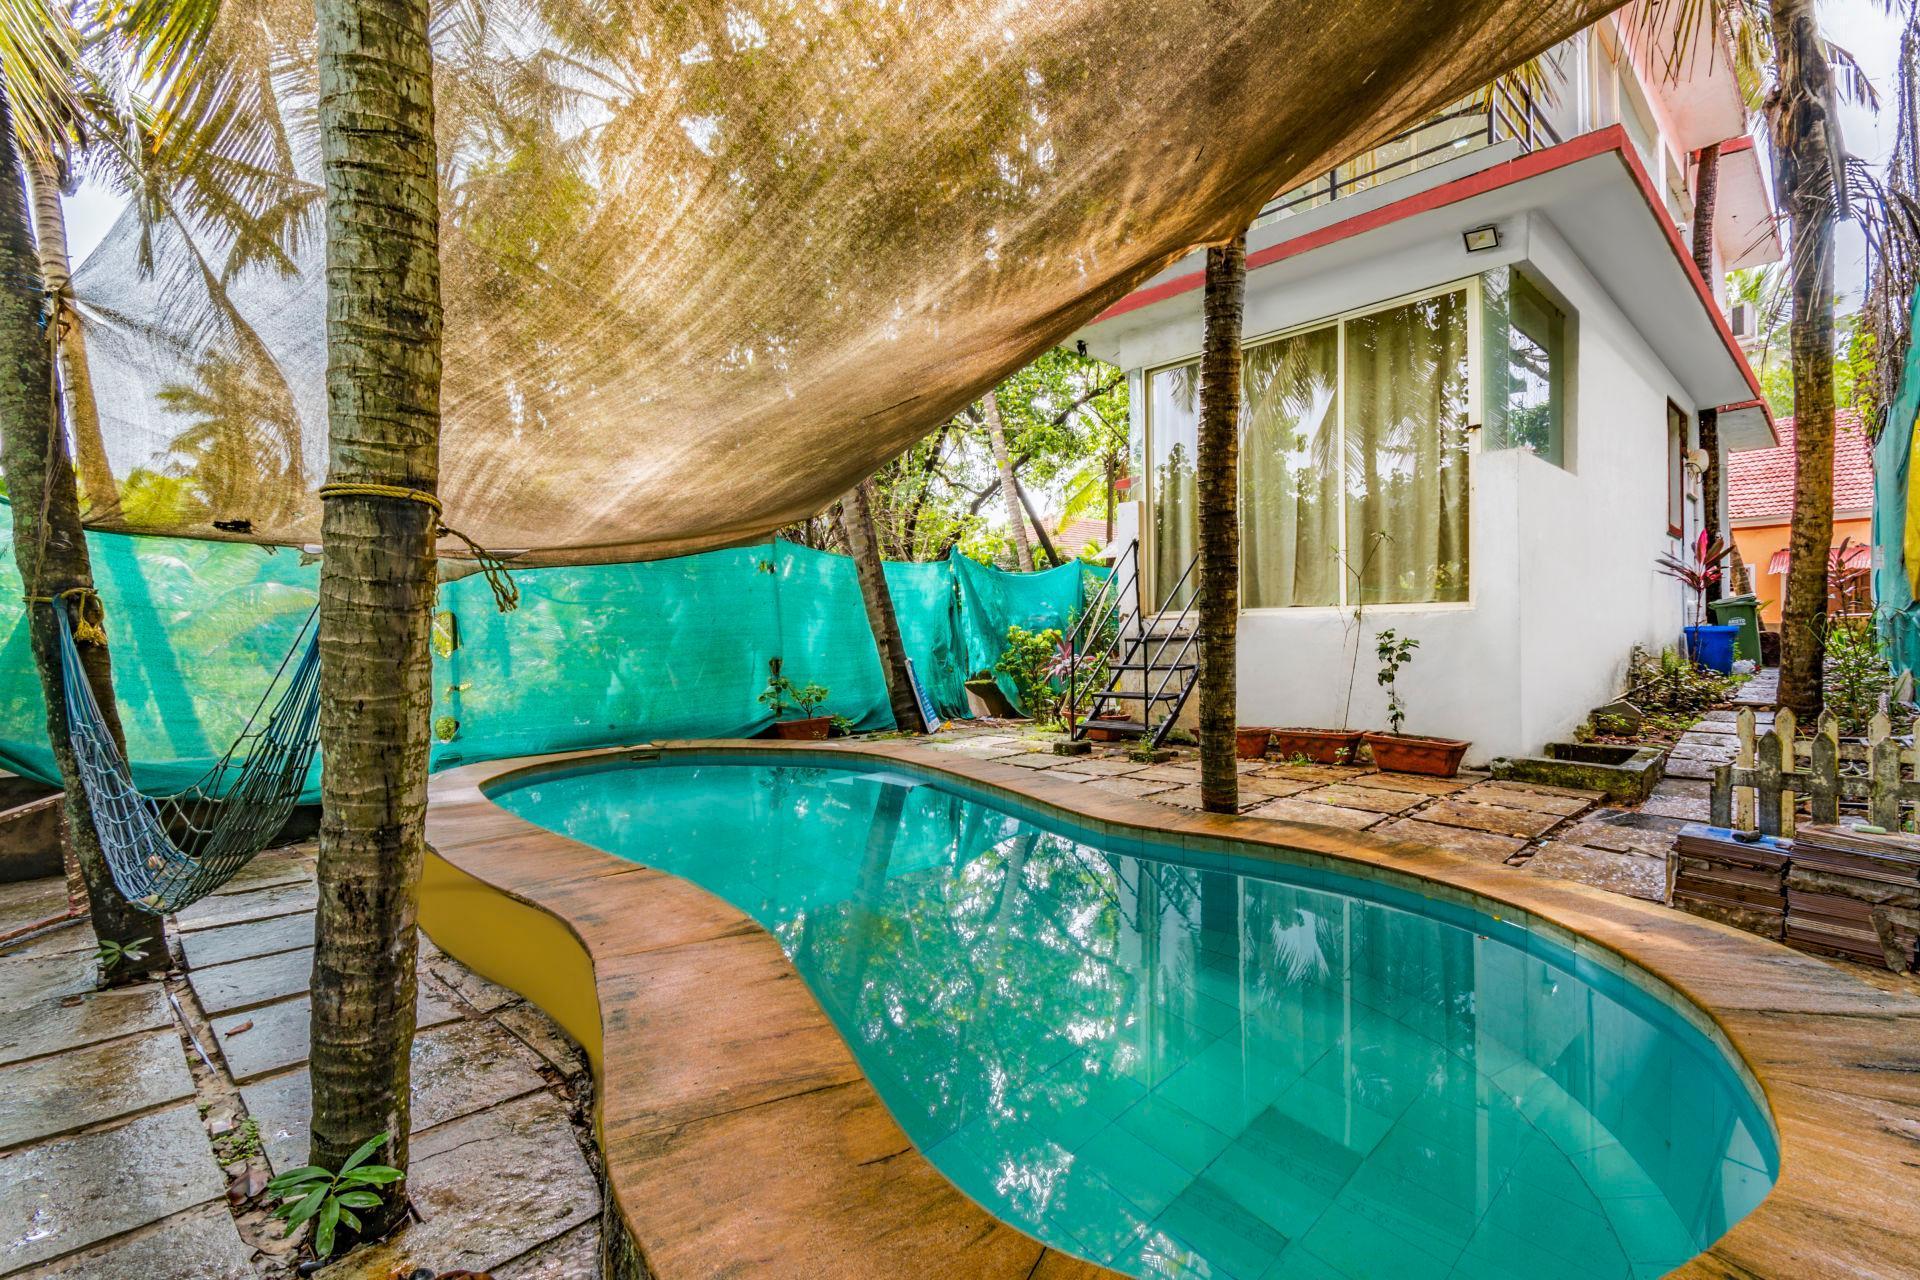 Quiet Pool Villa Amidst Greenery 74162